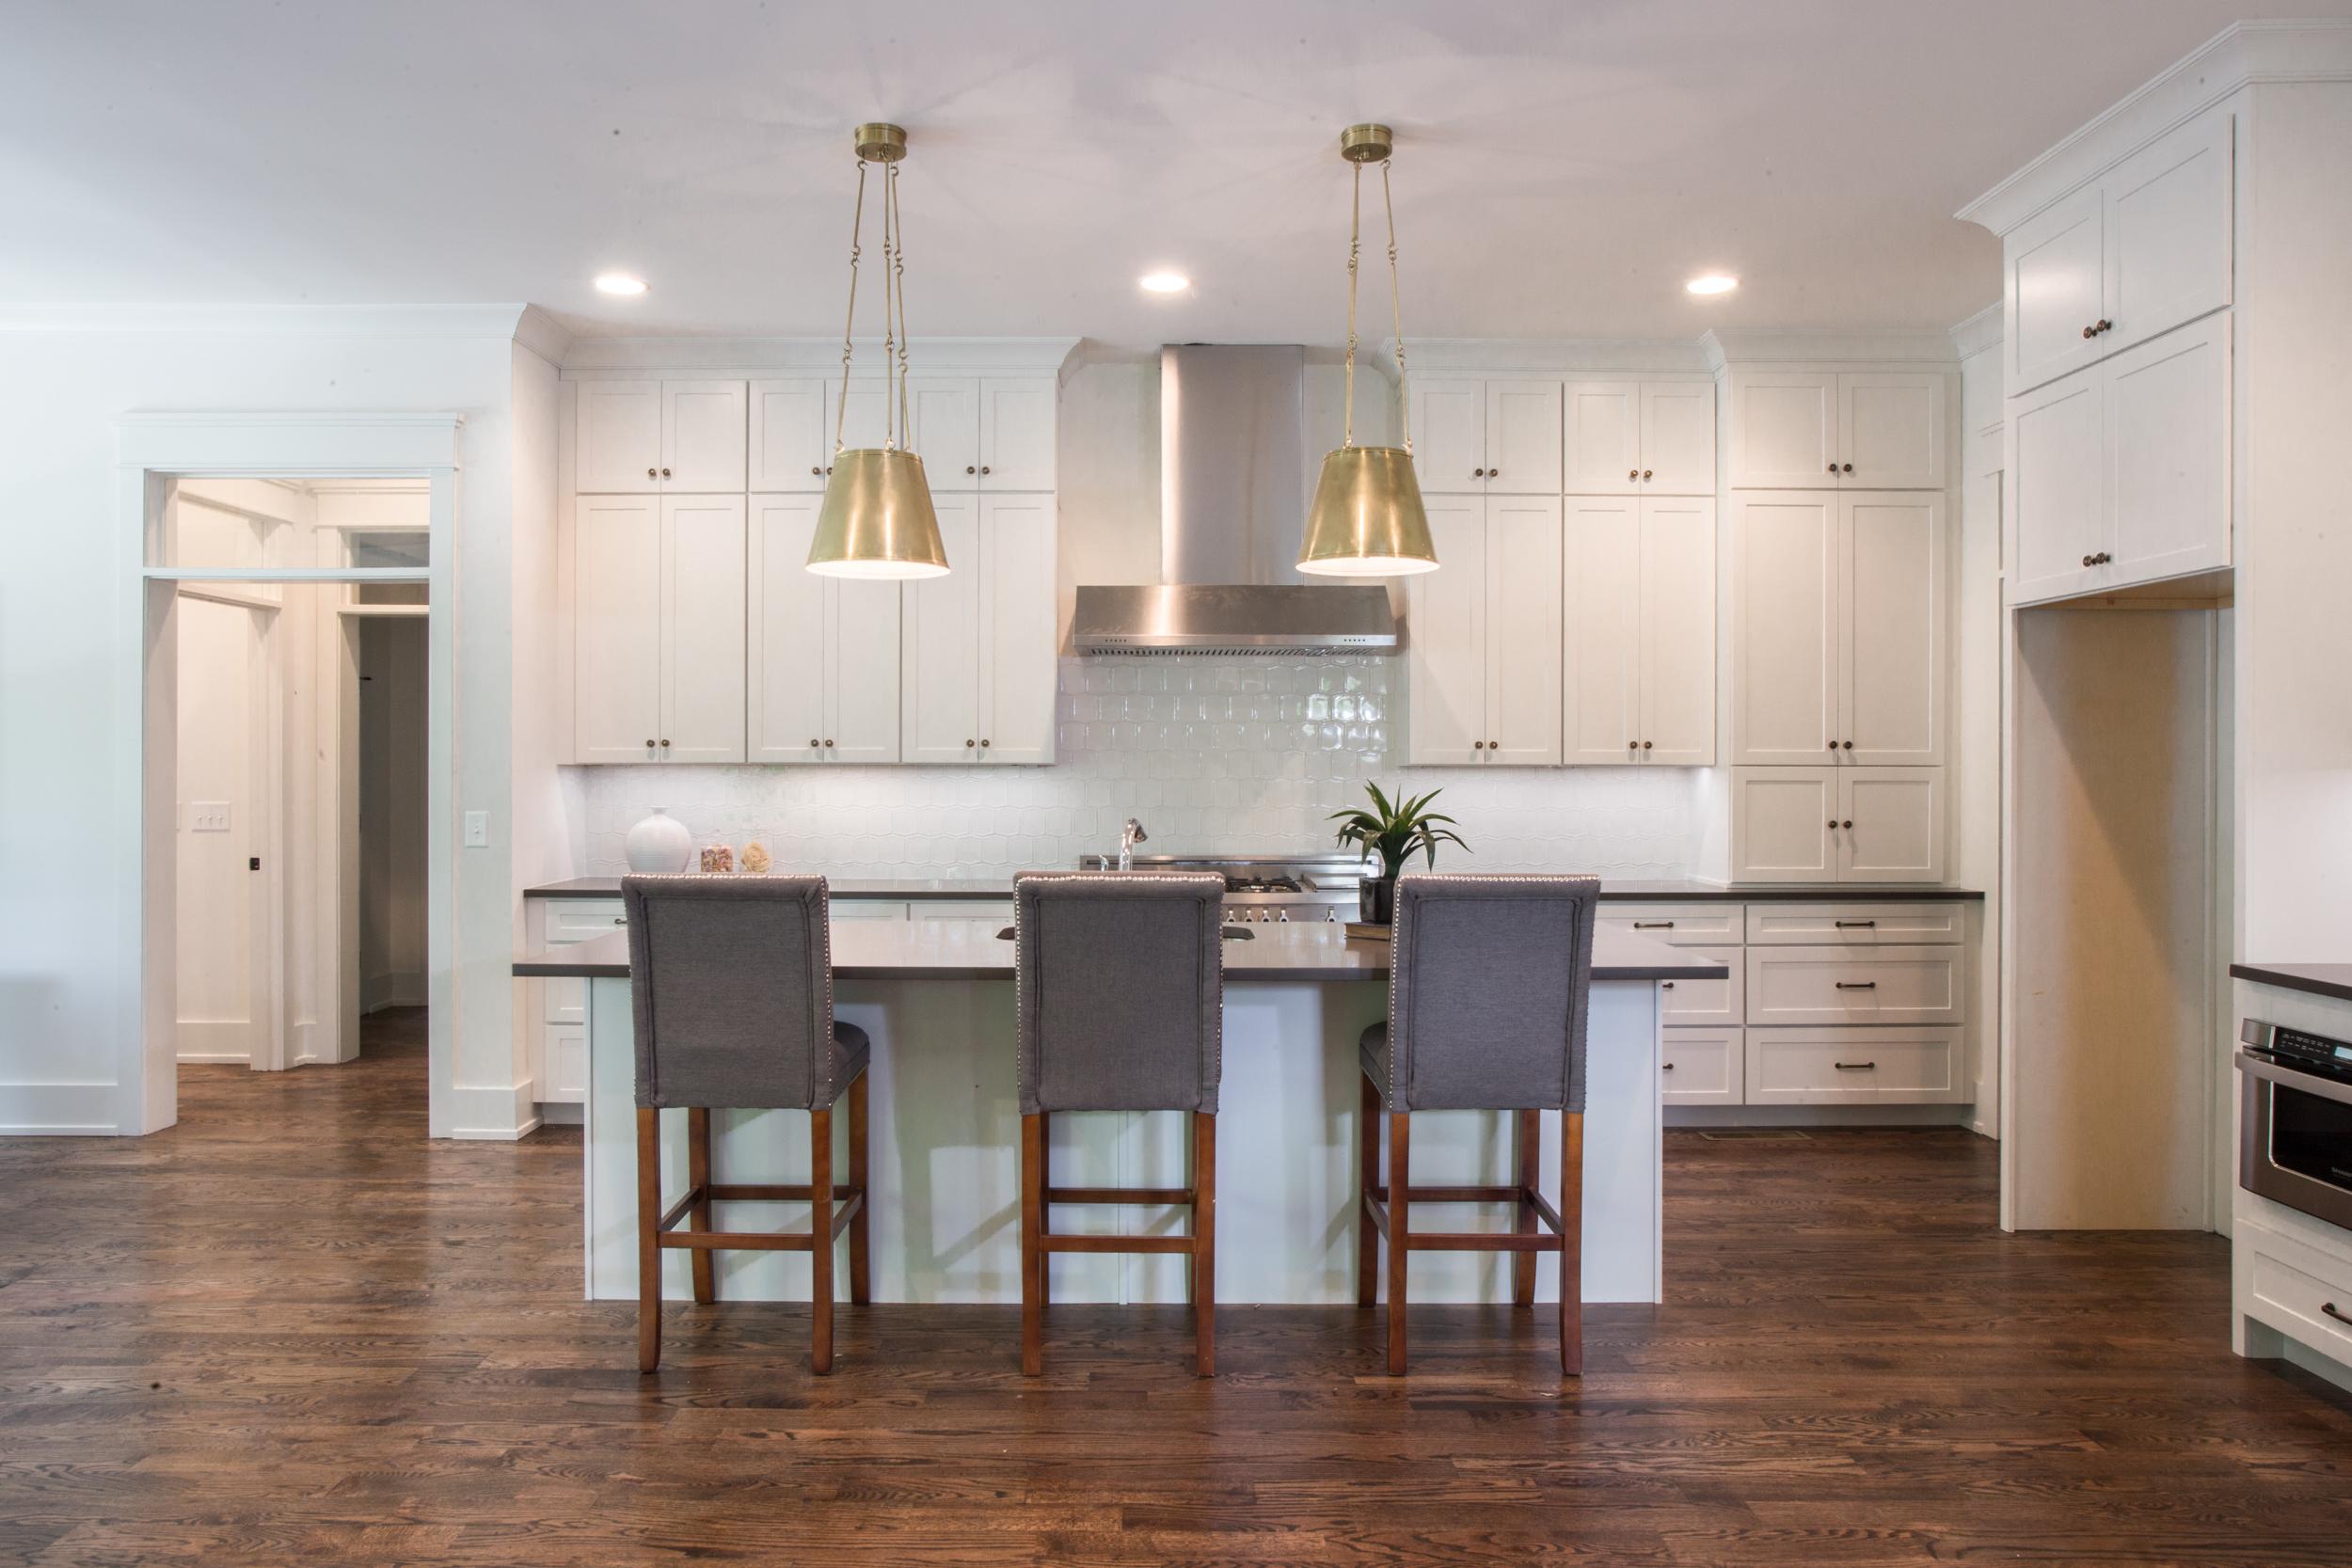 new-construction-nashville-custom-built-home-britt-development-group-7866.jpg